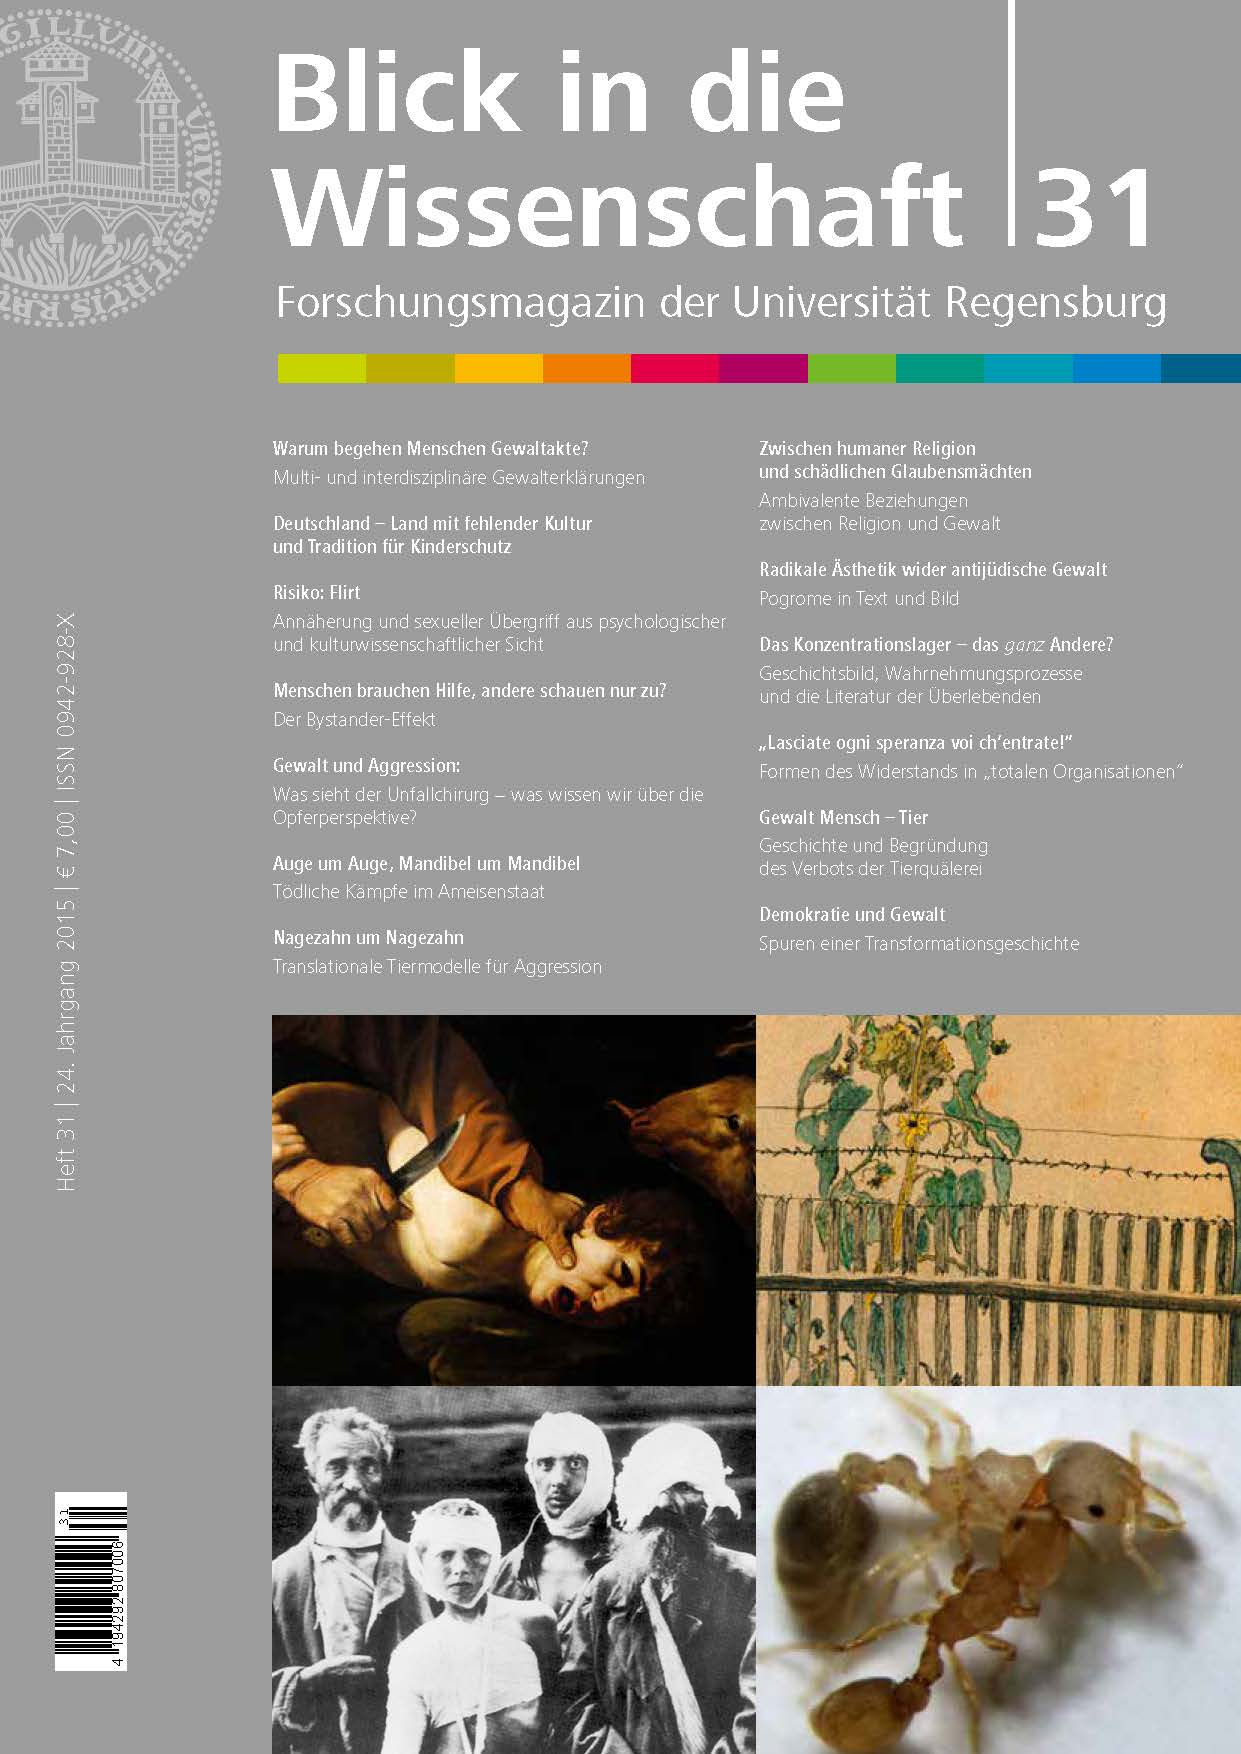 Forschungsmagazin der Universität Regensburg, Heft 31